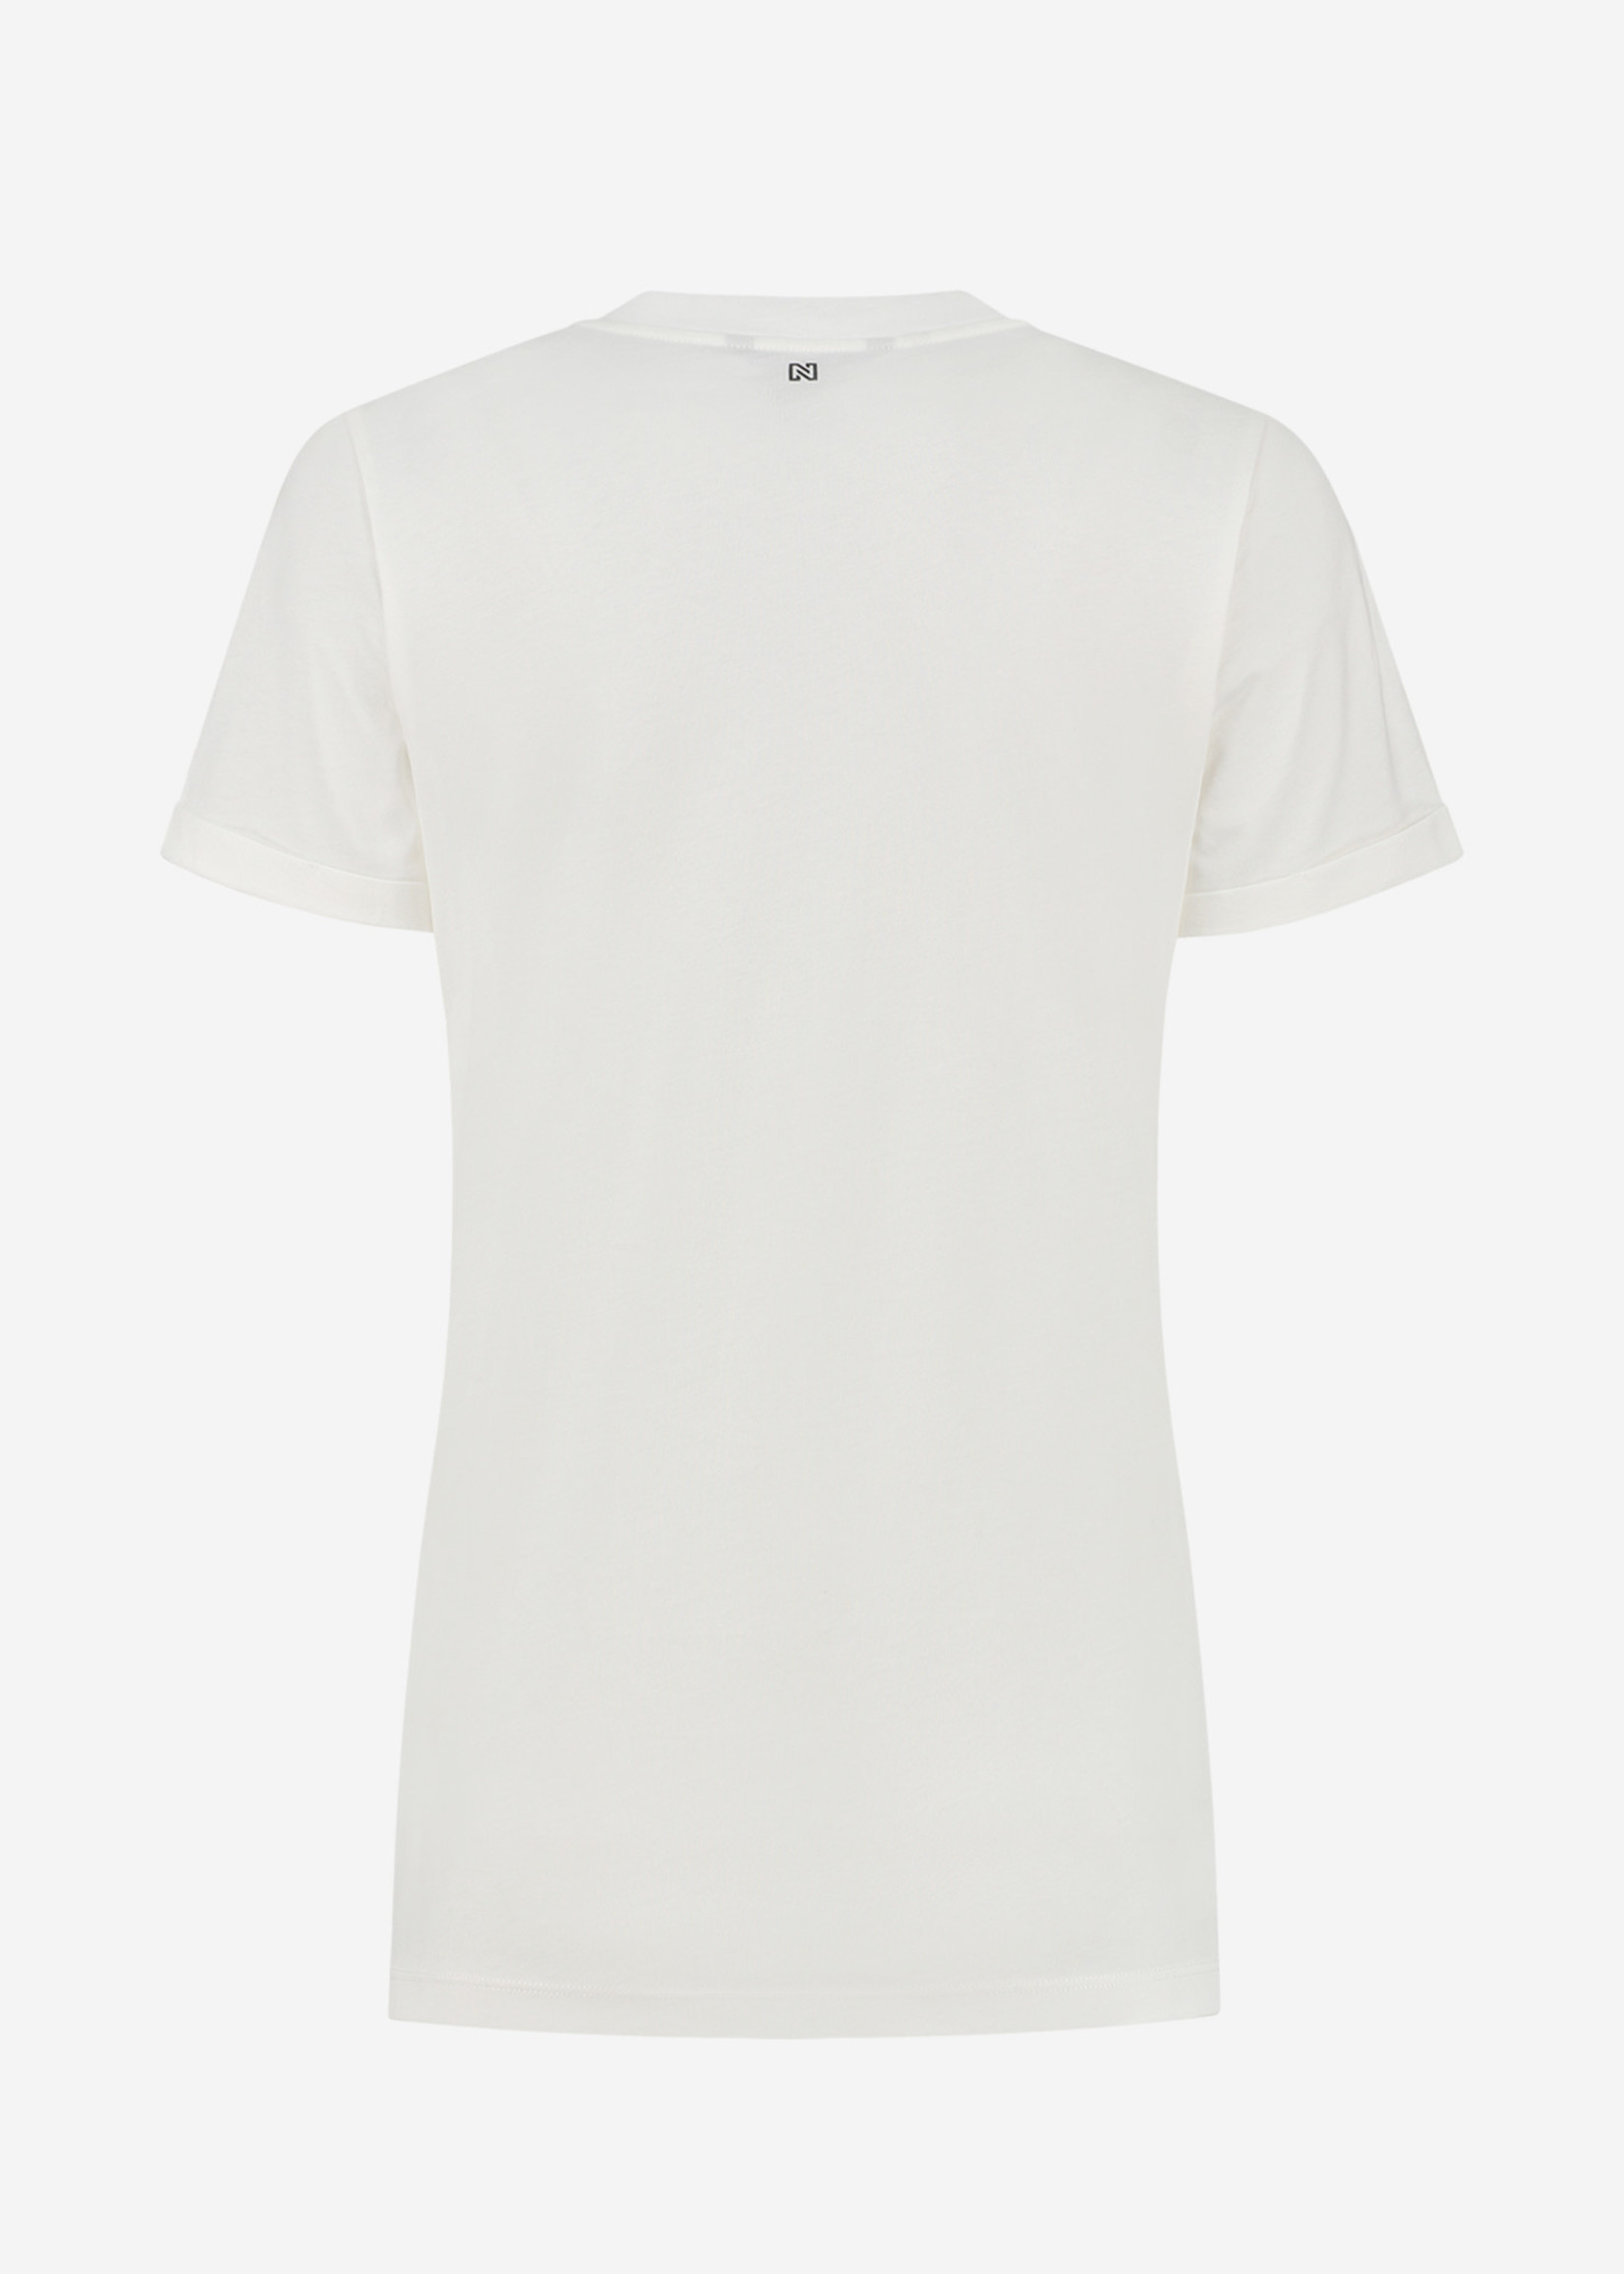 NIKKIE EAGLE BOYFRIEND ROLL UP T-SHIRT T-shirt met opgerolde mouwen